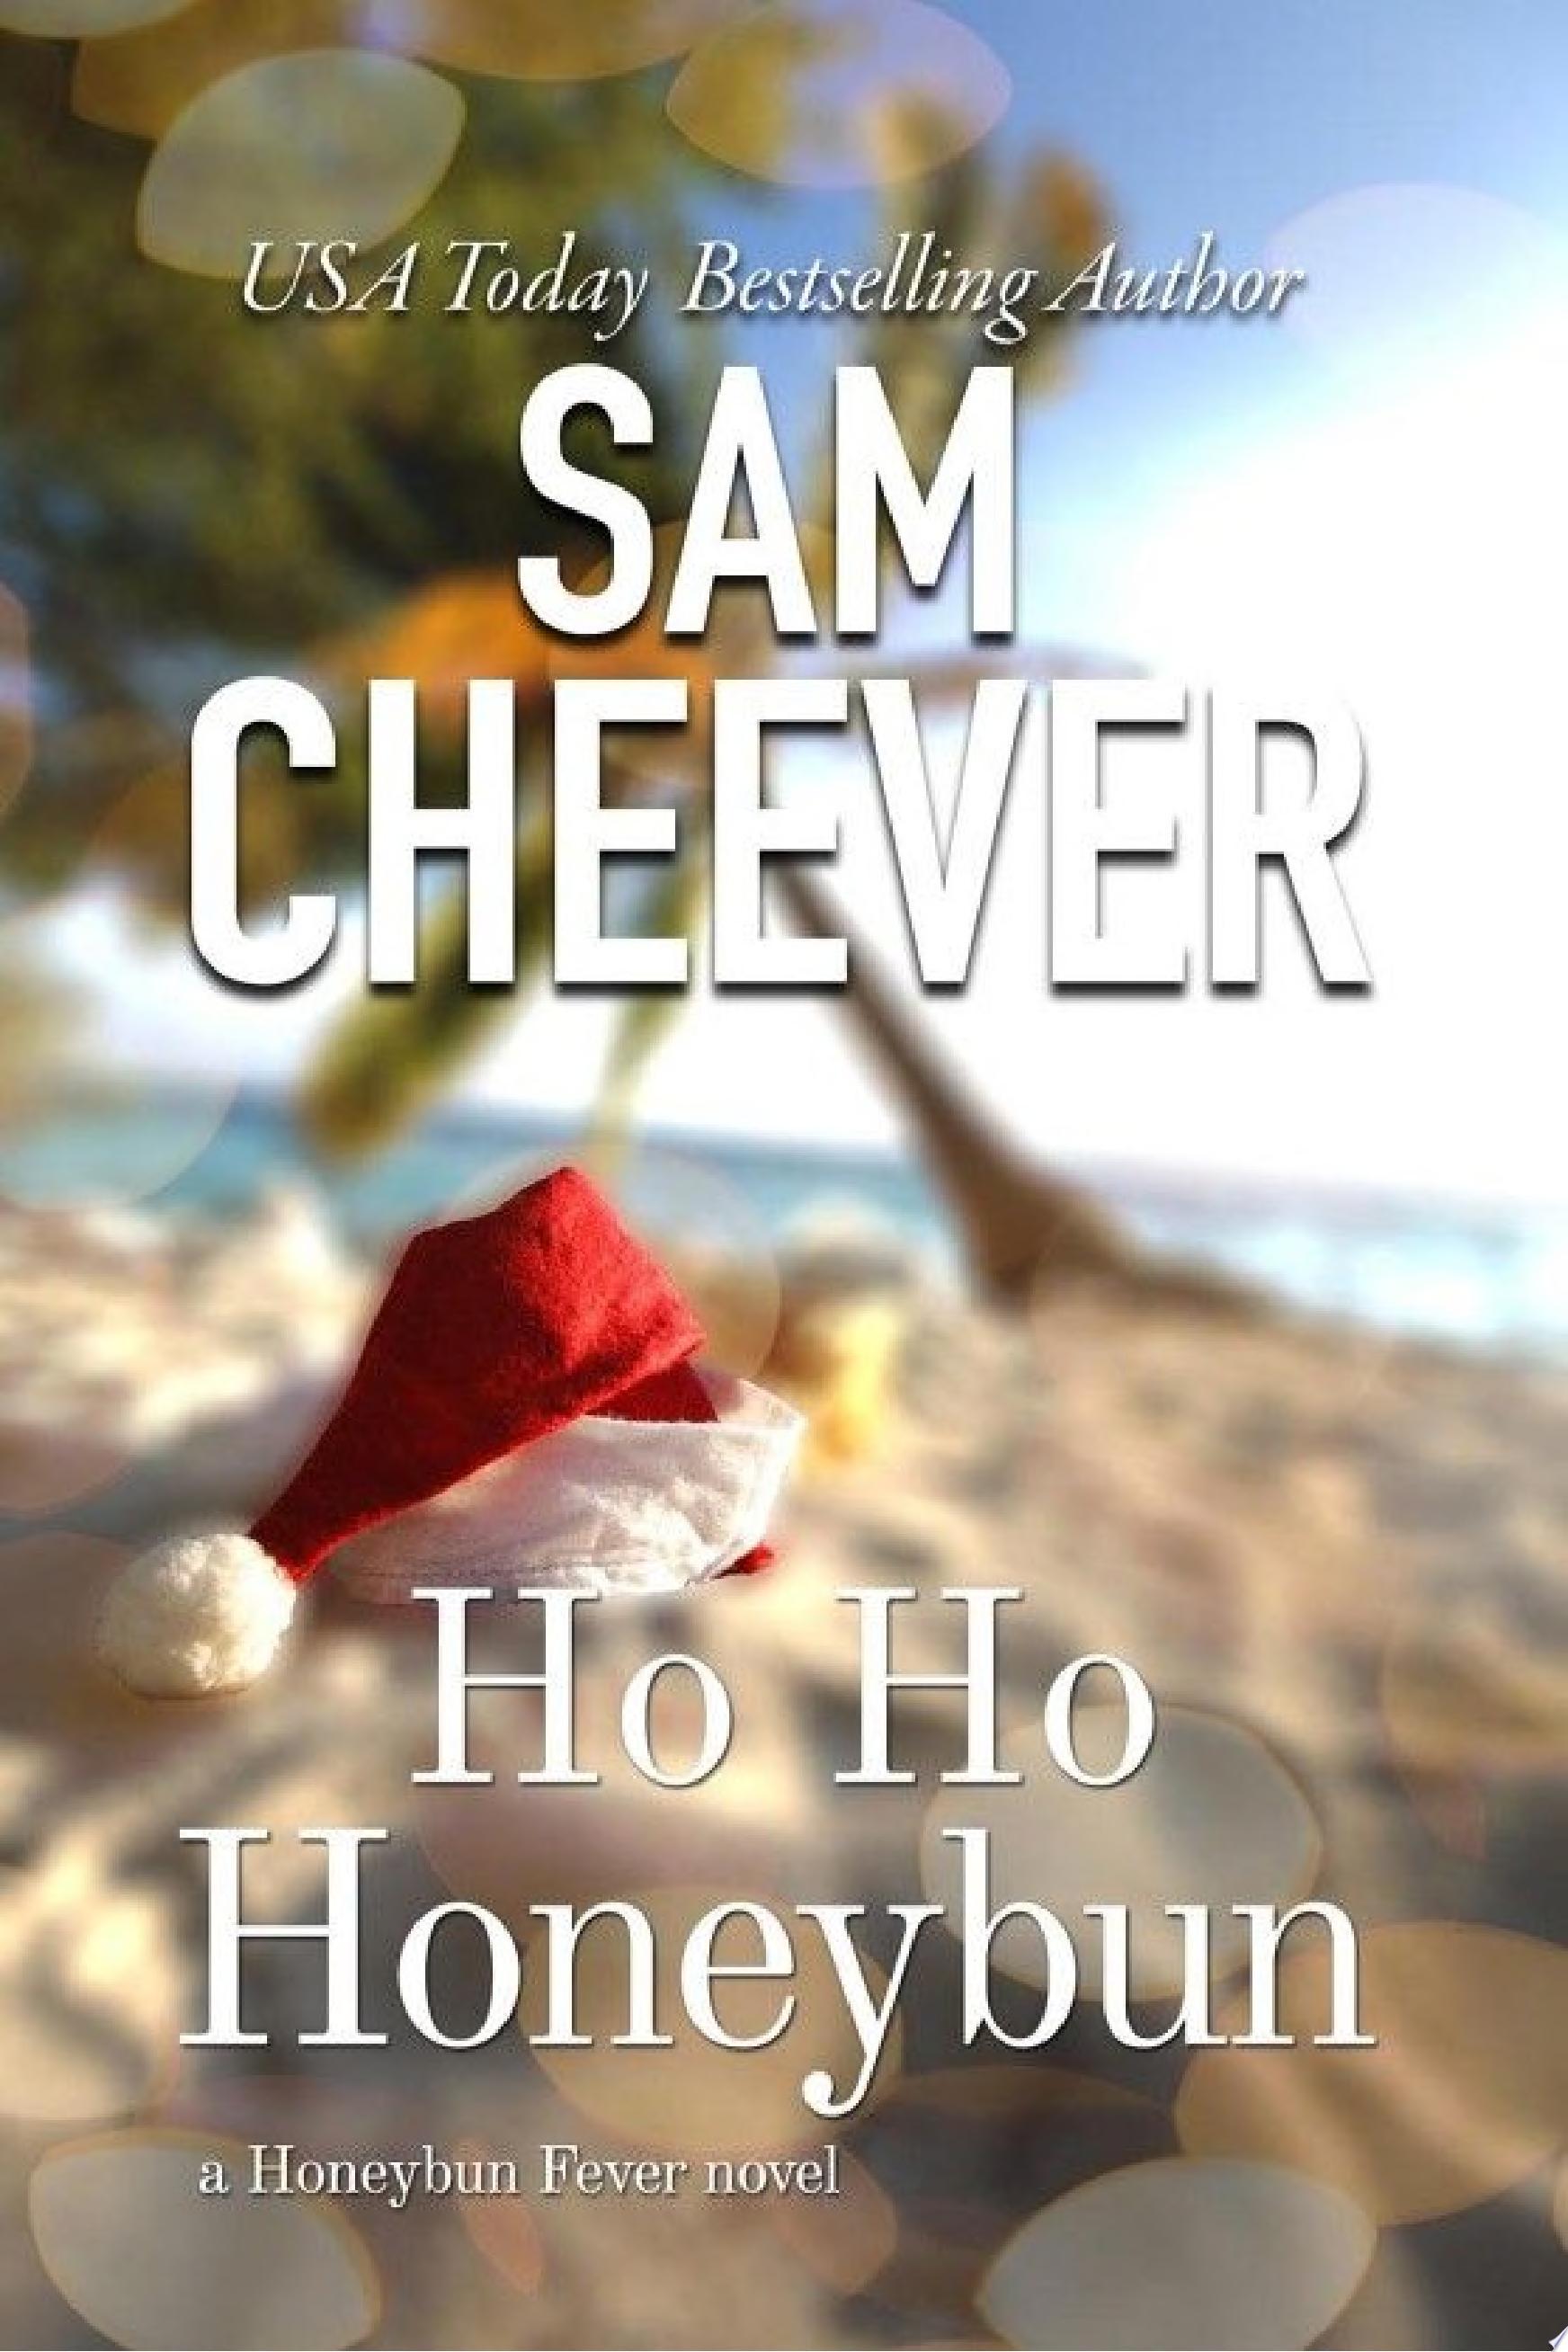 HoHo Honeybun  Romantic Suspense Mystery